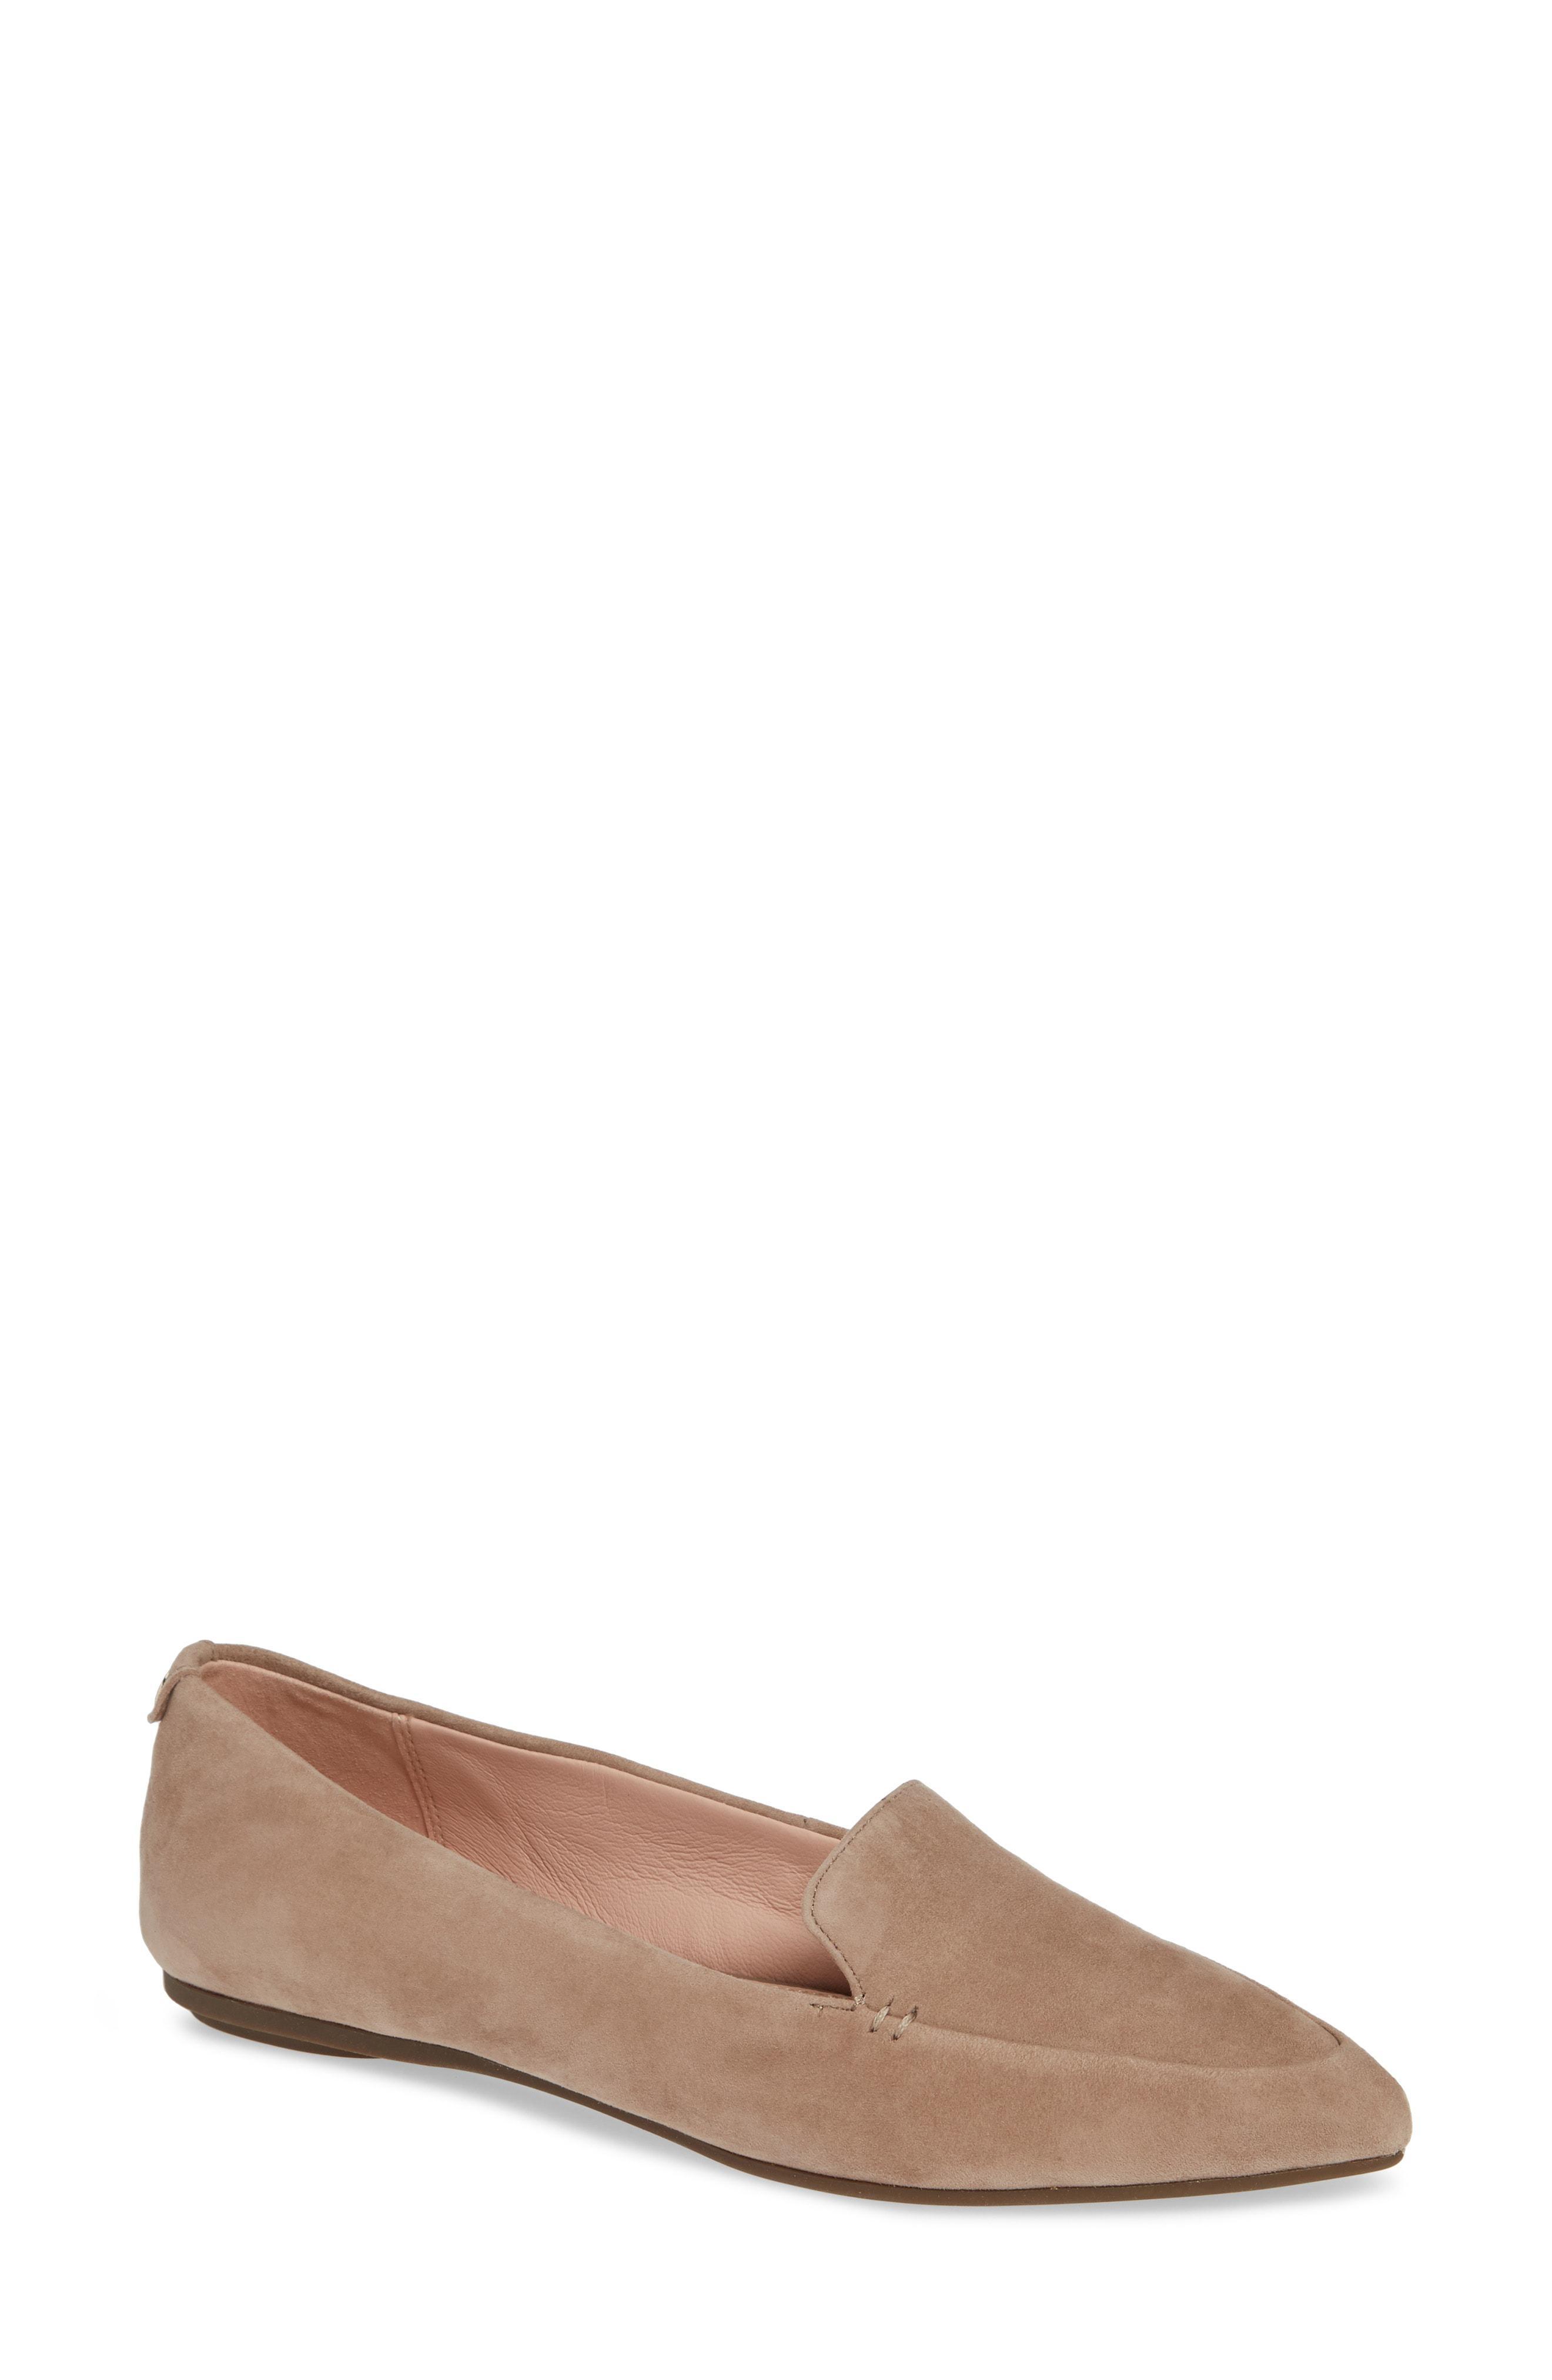 06fa620f290 Lyst - Taryn Rose Faye Pointy Toe Loafer in Pink